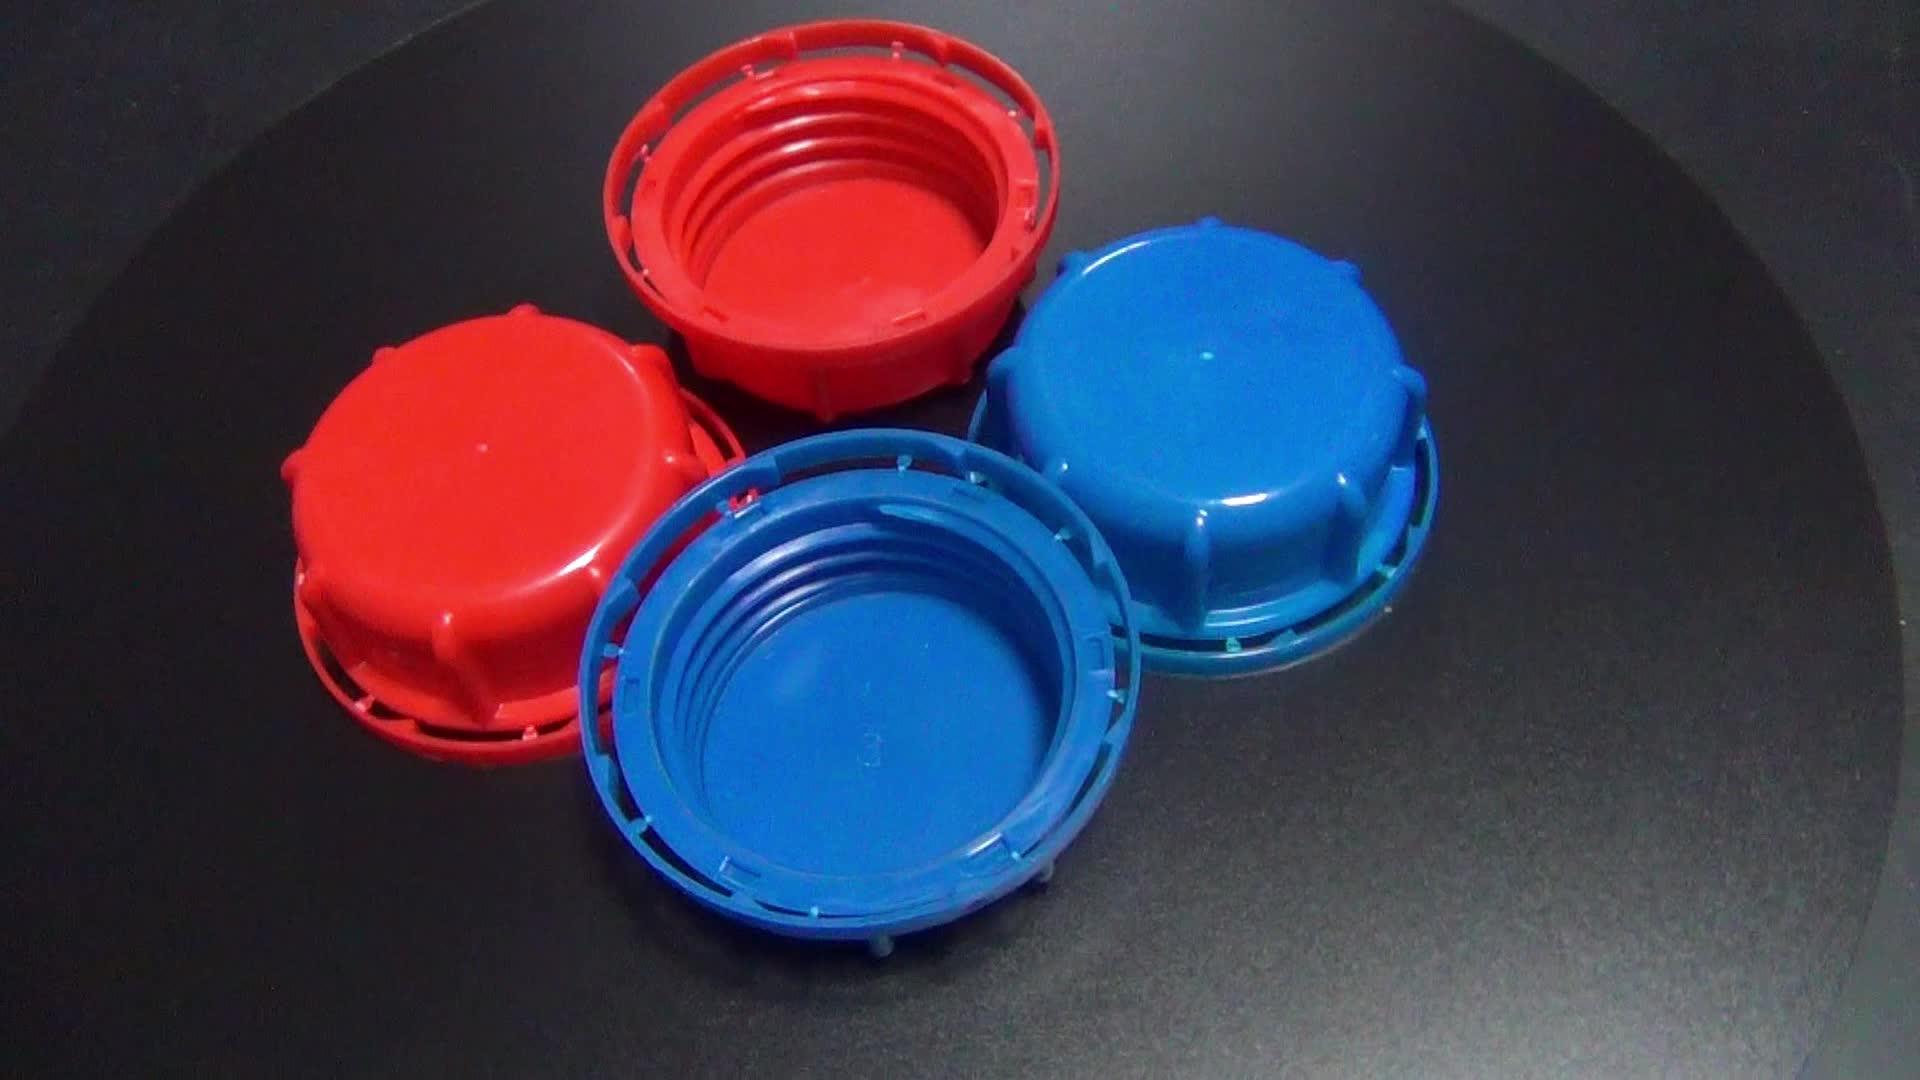 20l 25 リットル 5 ガロンプラスチックジェリー缶スクリューキャップ金型